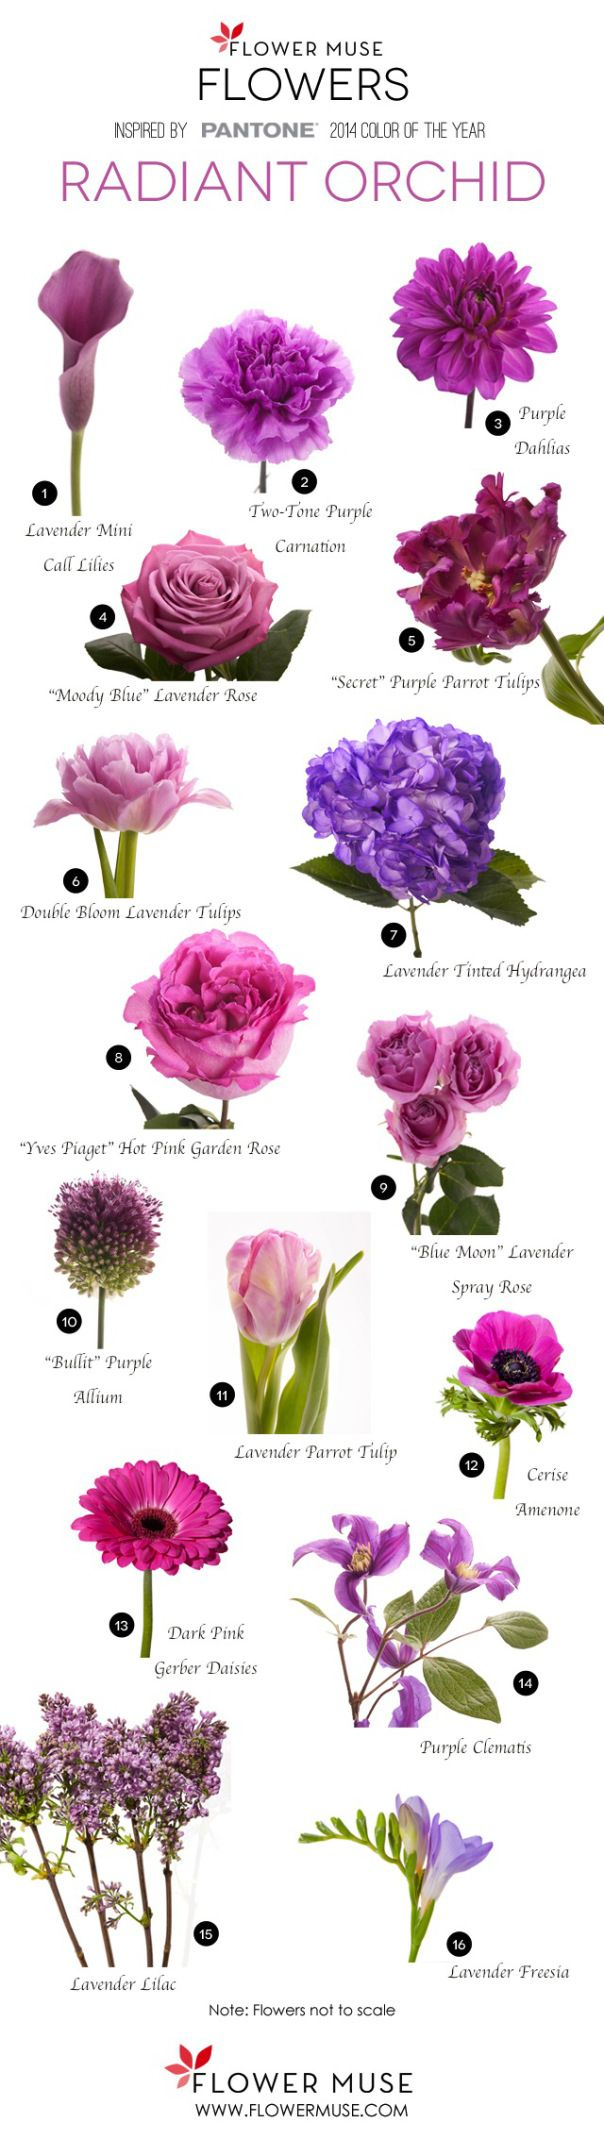 Best 25+ Pink flower names ideas on Pinterest | Blush flowers ...